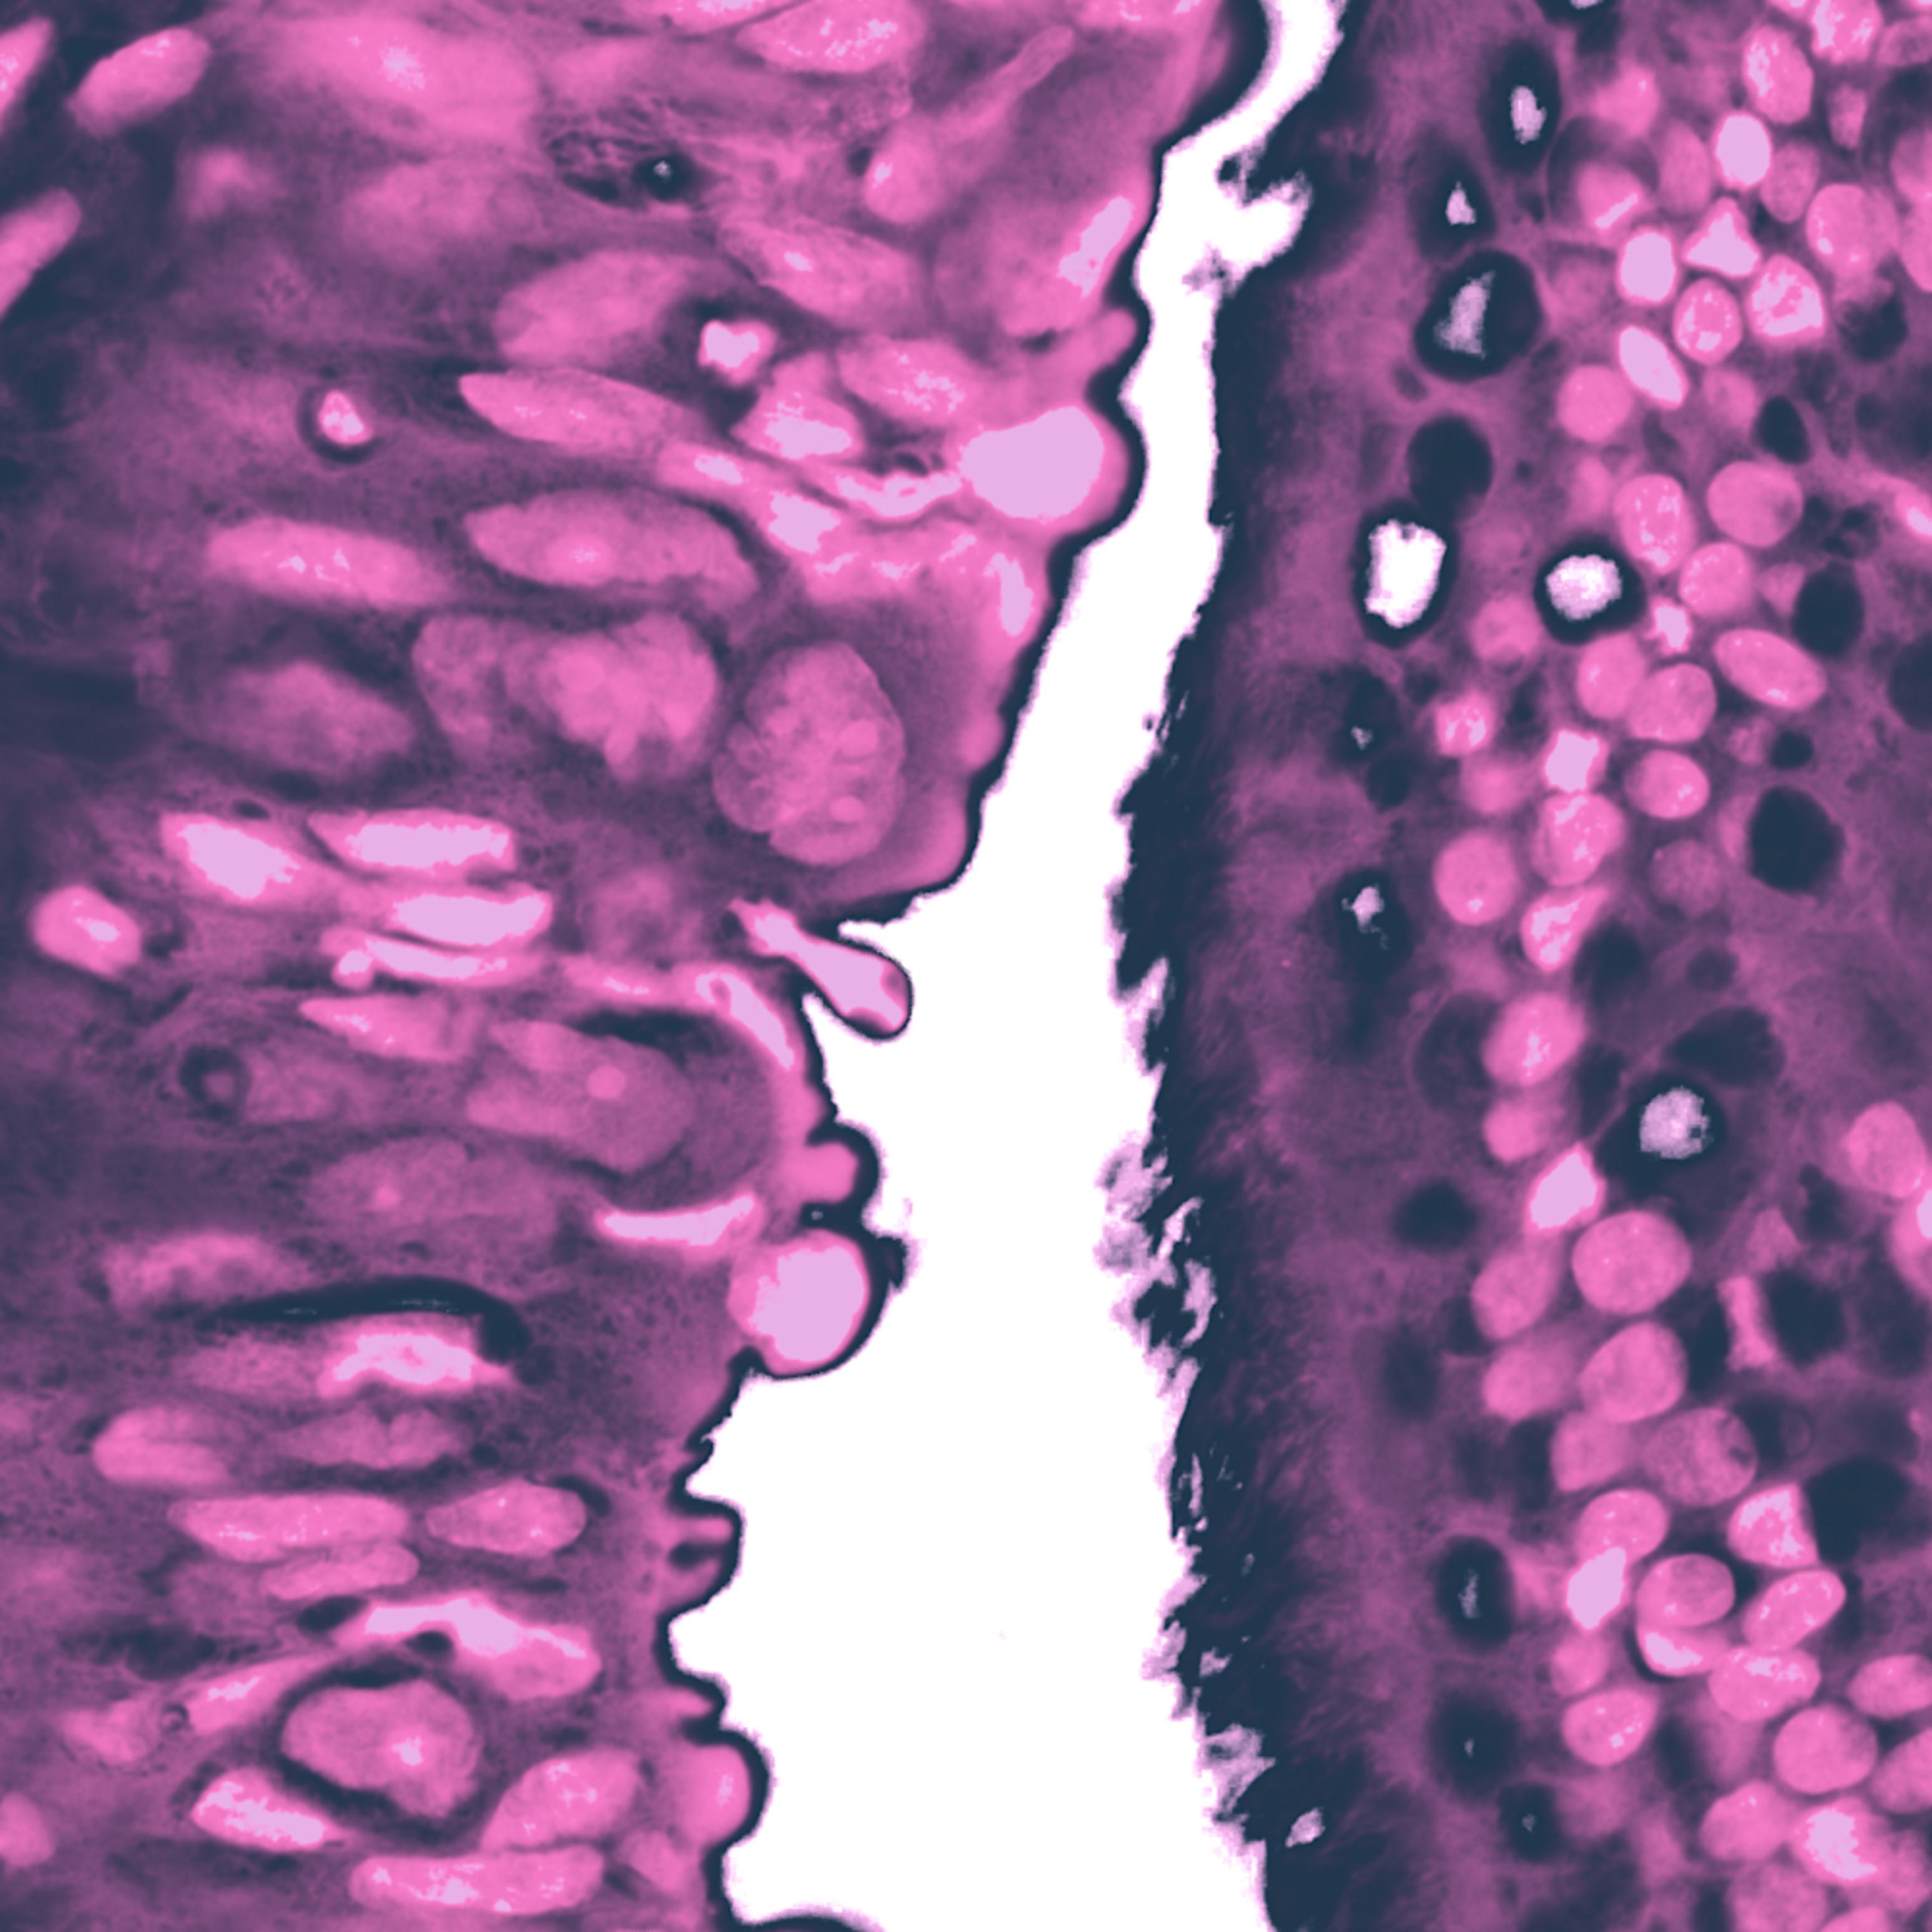 901 0001 womens health   ovary   tubal serous carcinoma   100x ddvov9